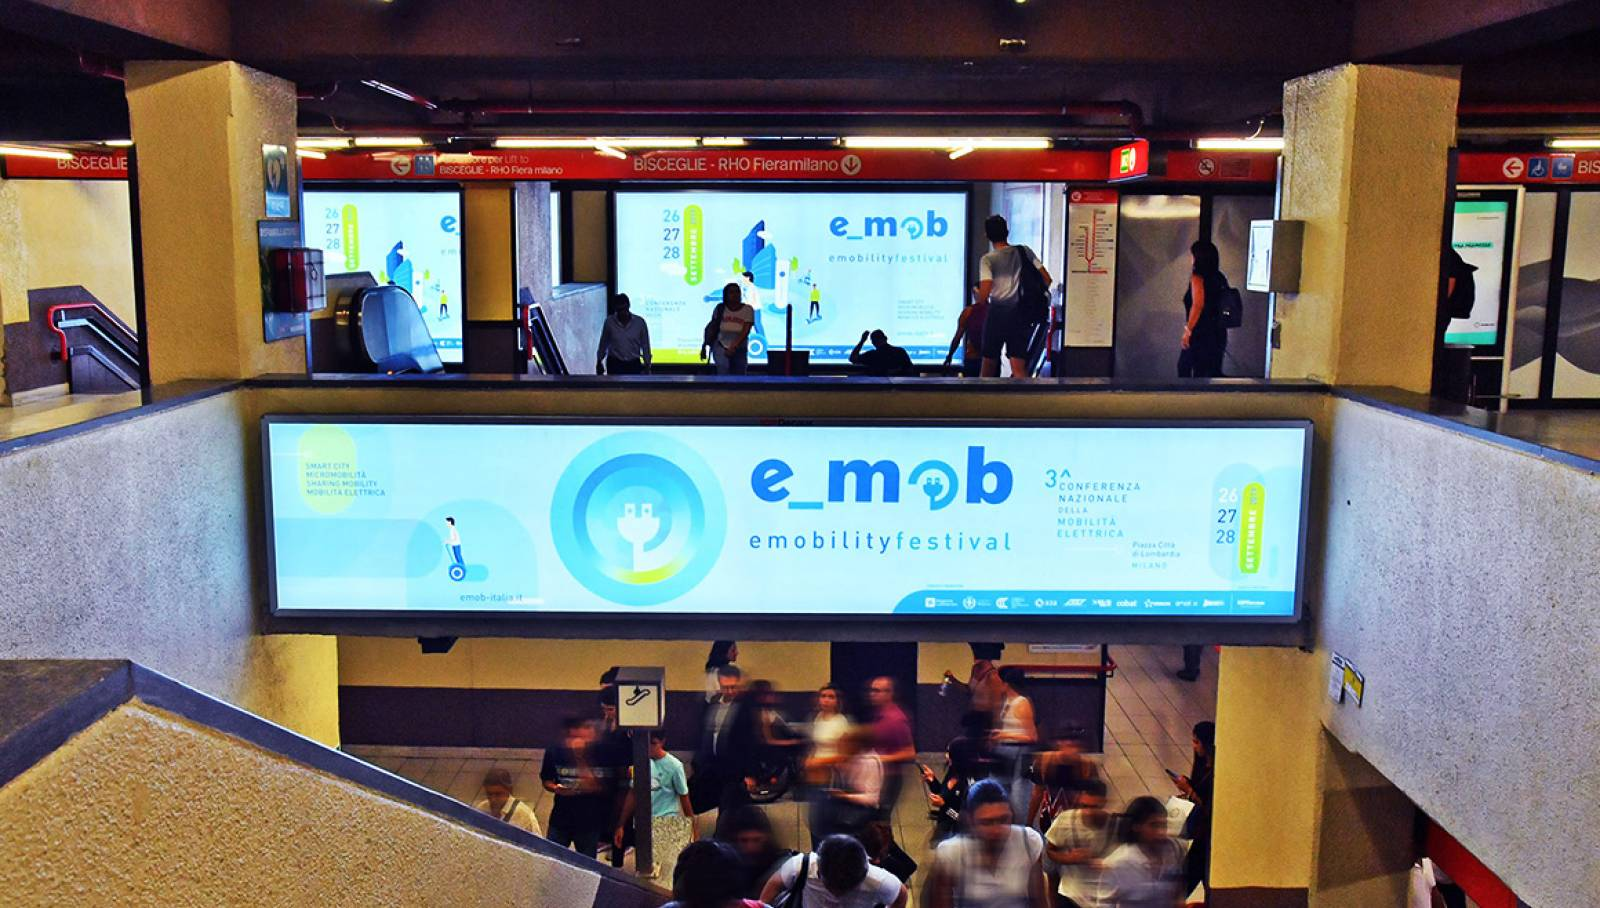 IGPDecaux Station Domination Milano Festival E-mob